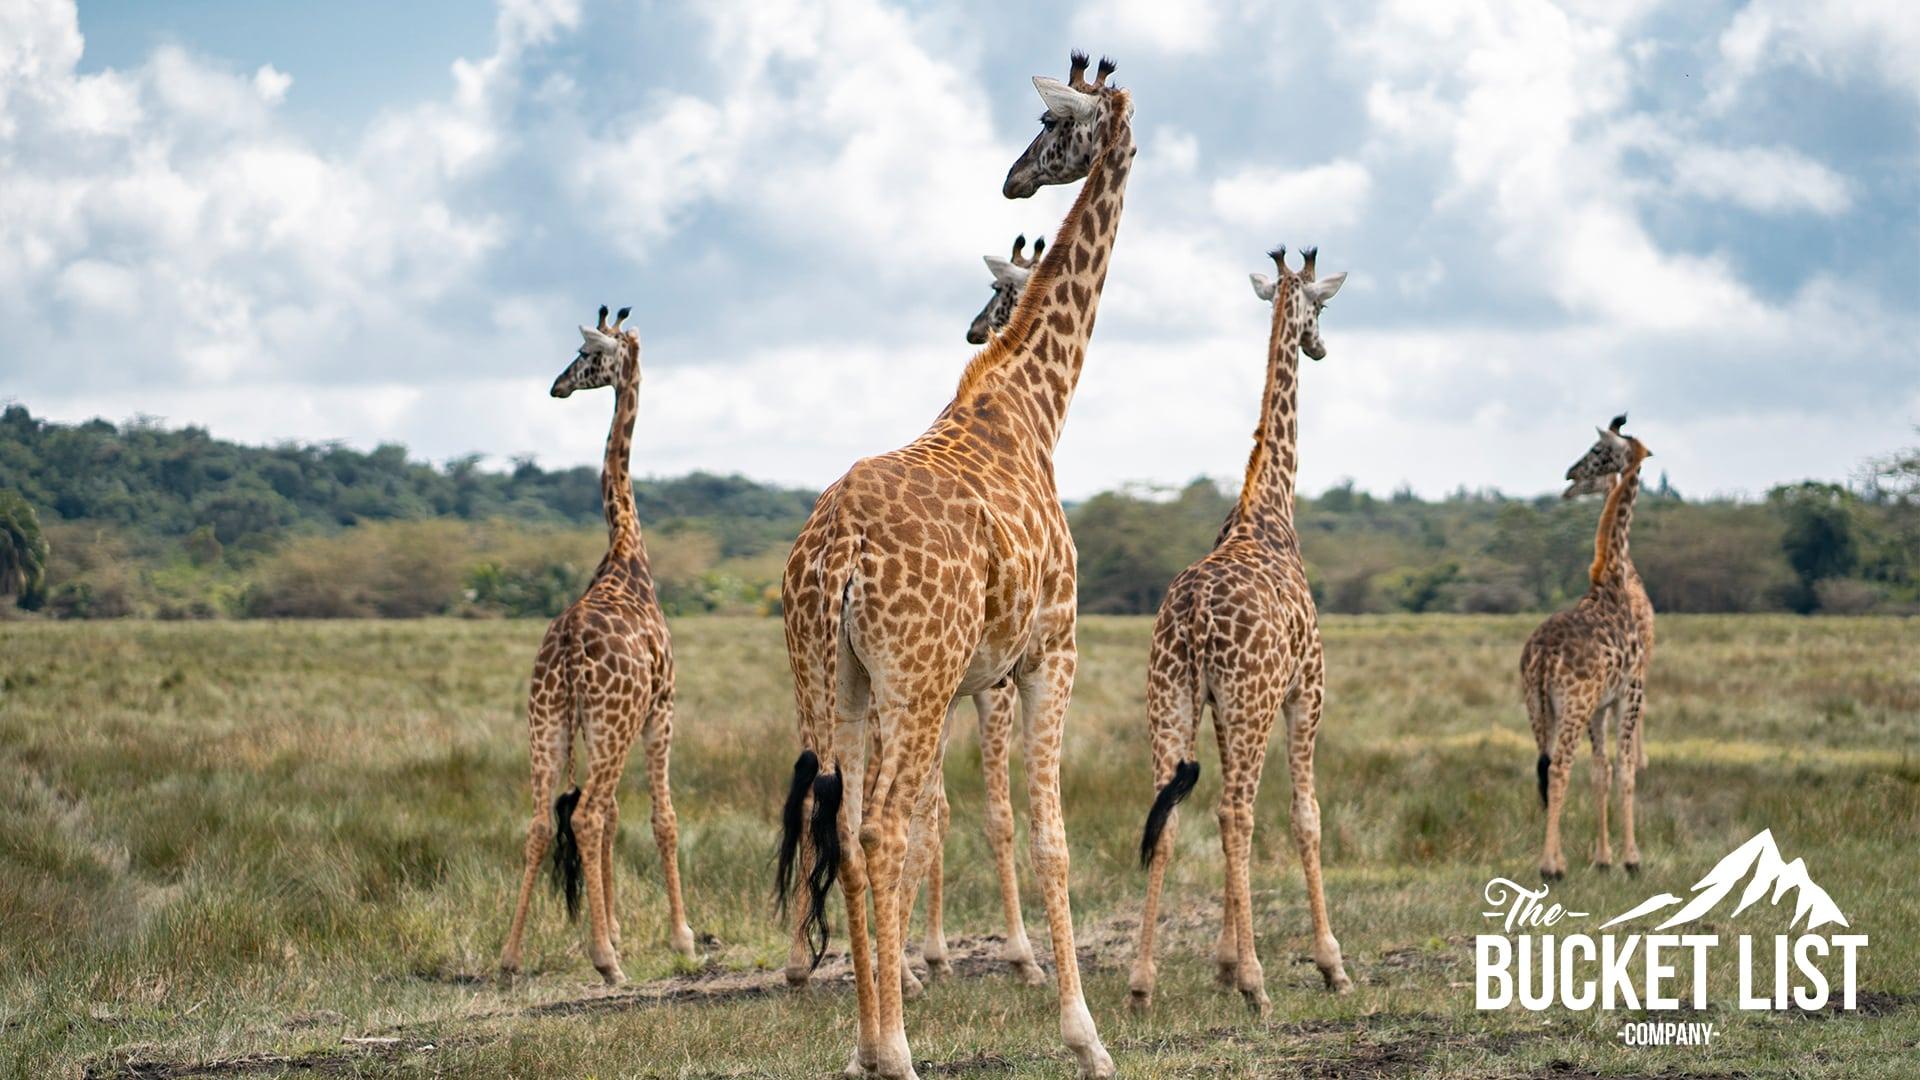 a heard of Giraffes in Tanzania